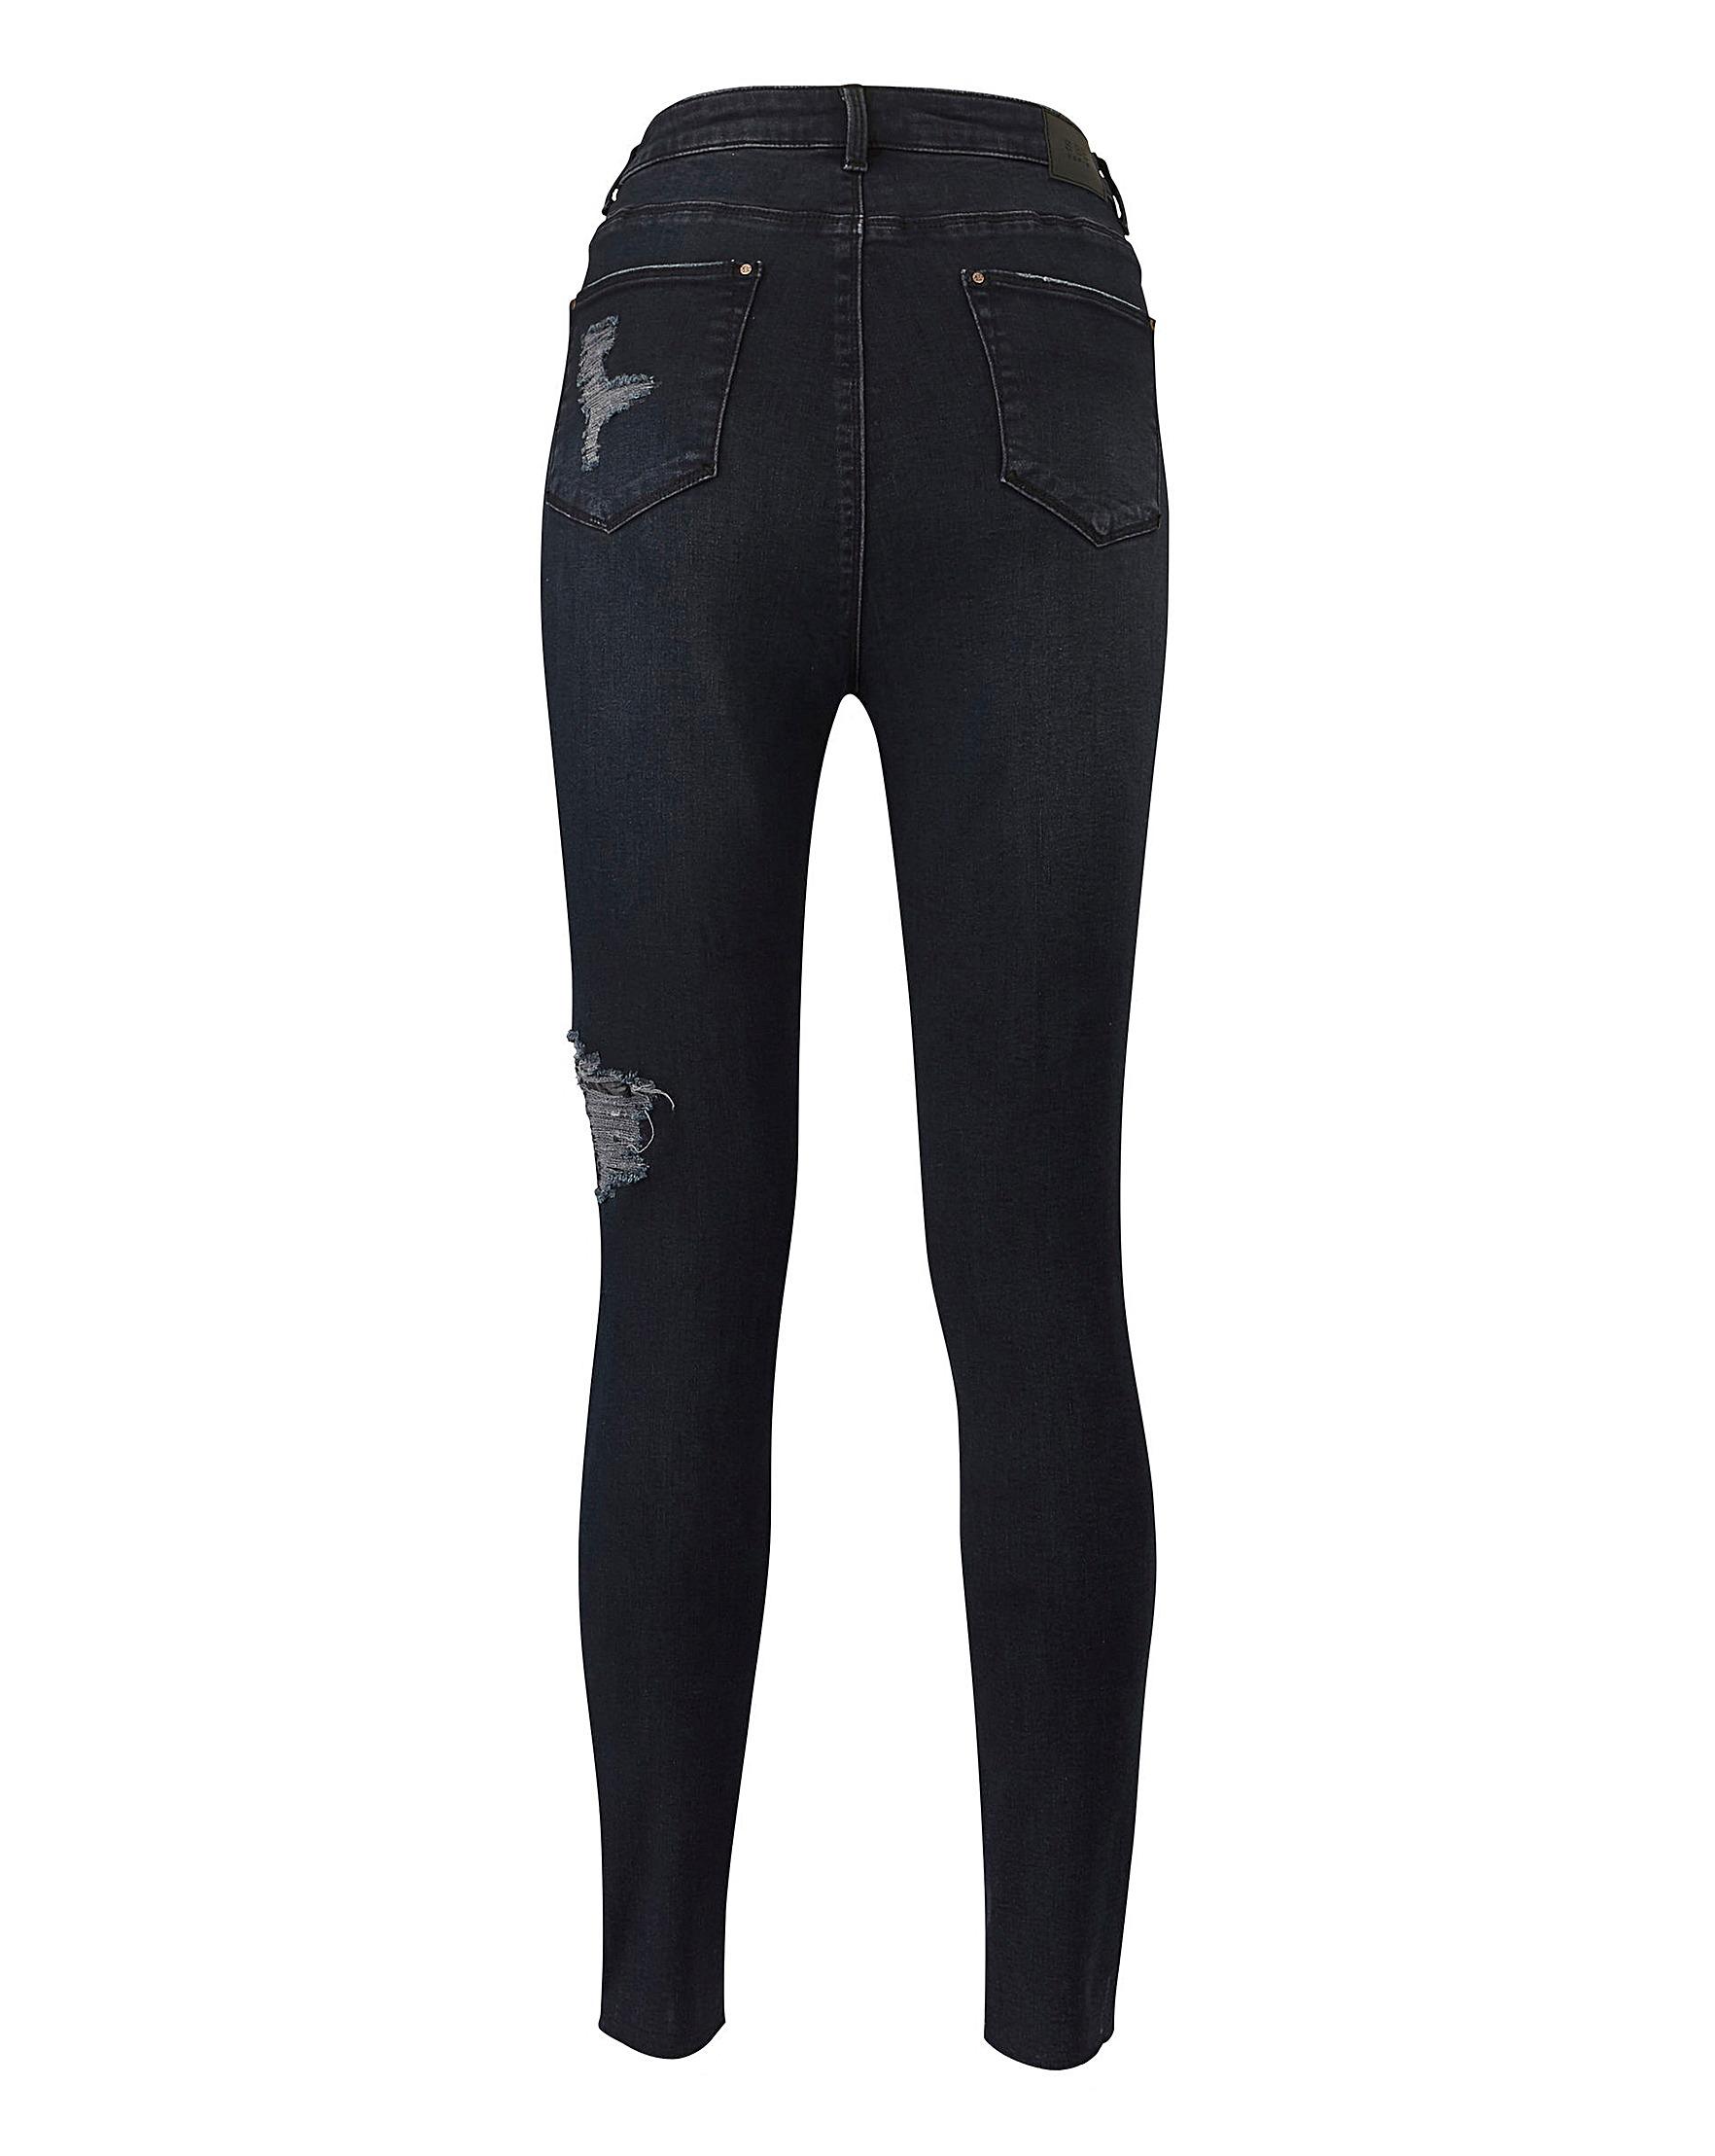 58c89f0d708 Indigo Chloe Ripped Skinny Jeans | Fashion World